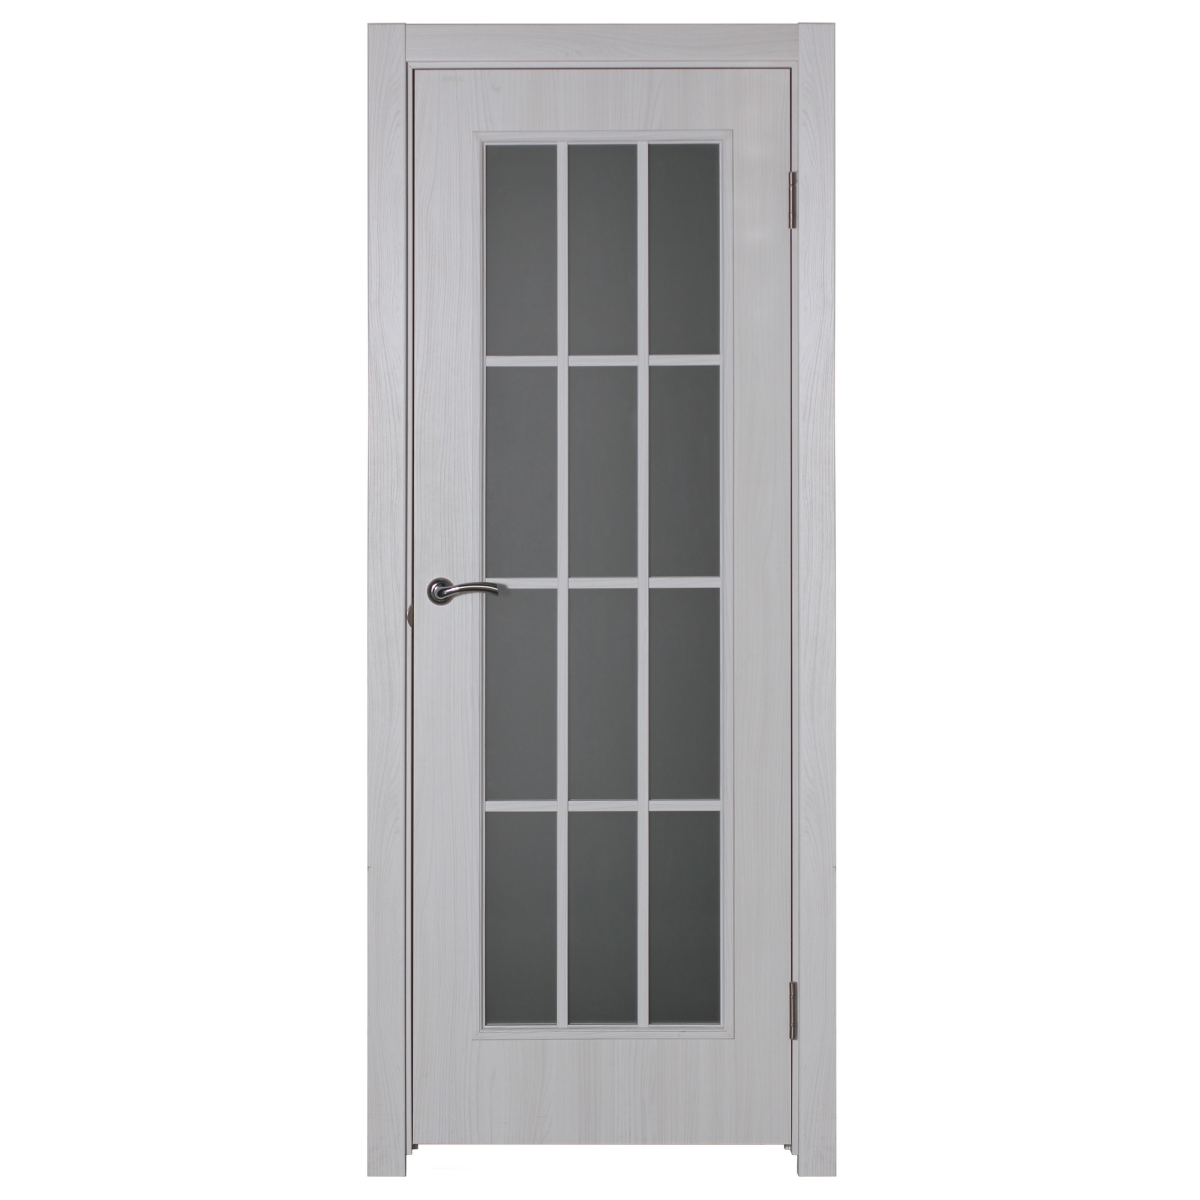 Дверь Межкомнатная Остеклённая Провенца 90x200 Цвет